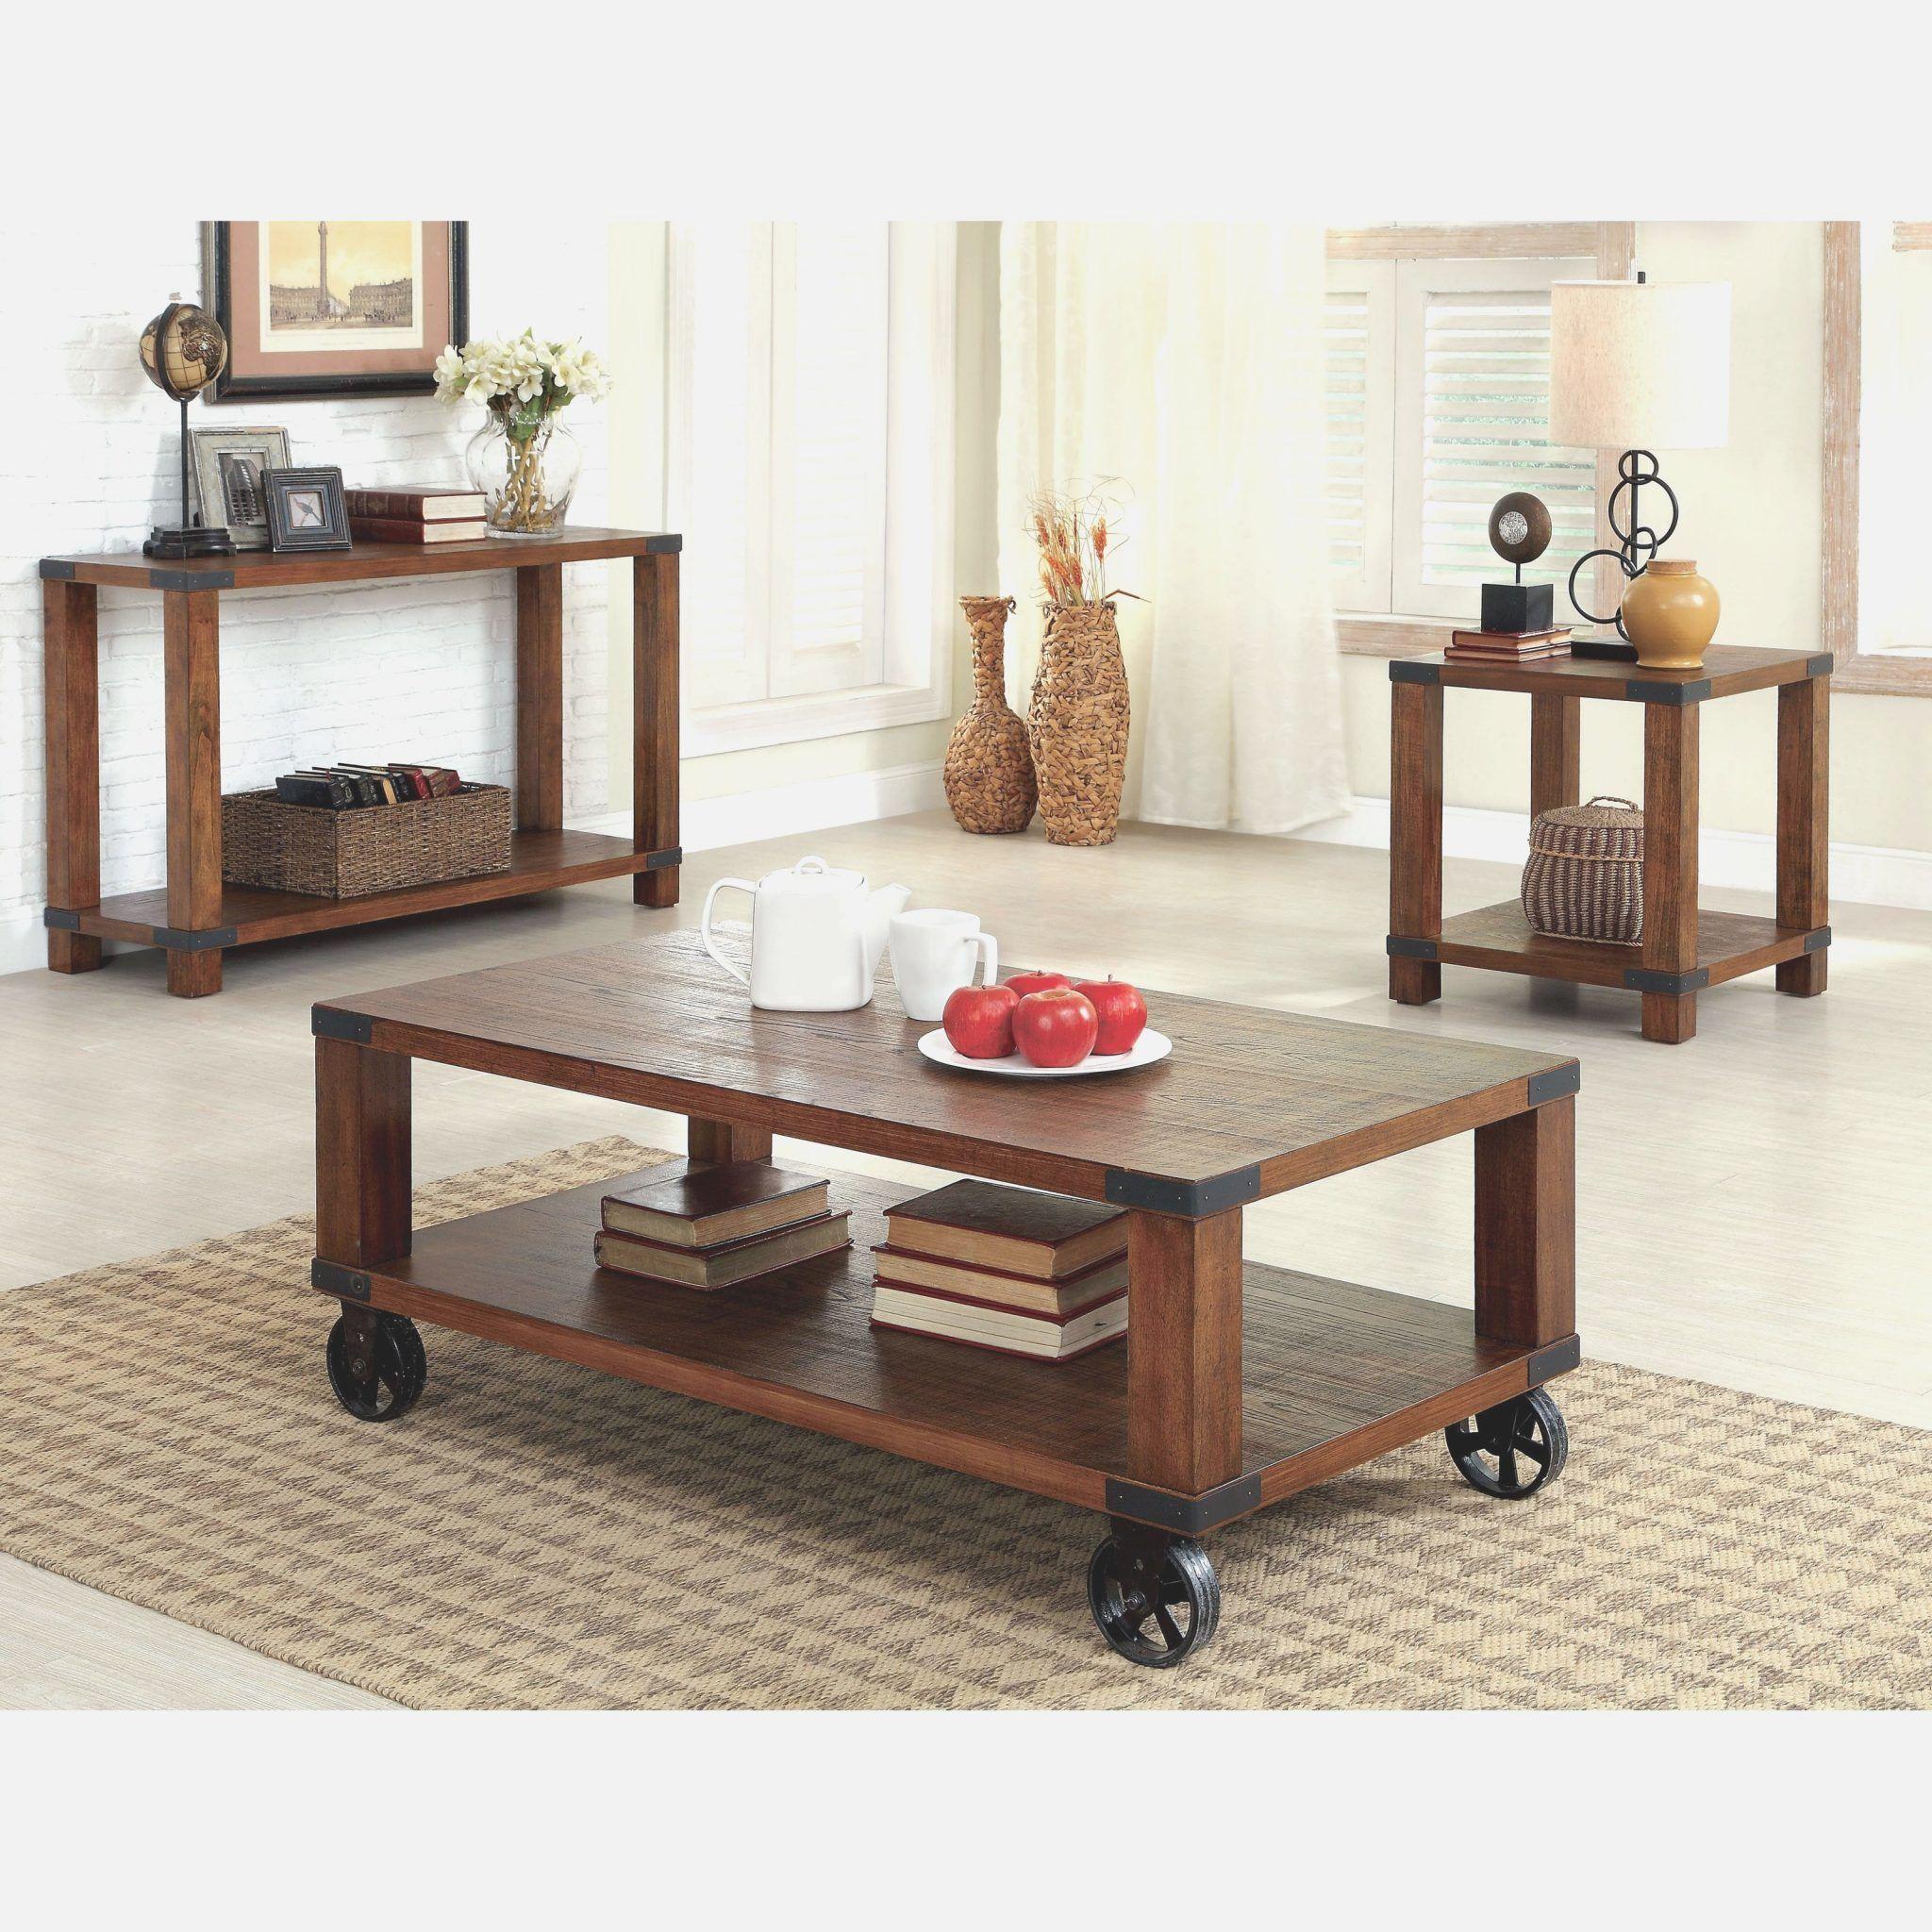 Of Distinction Furniture Ikea Restaurant Small Bedroom Queen Gembloong World Jackson Tn